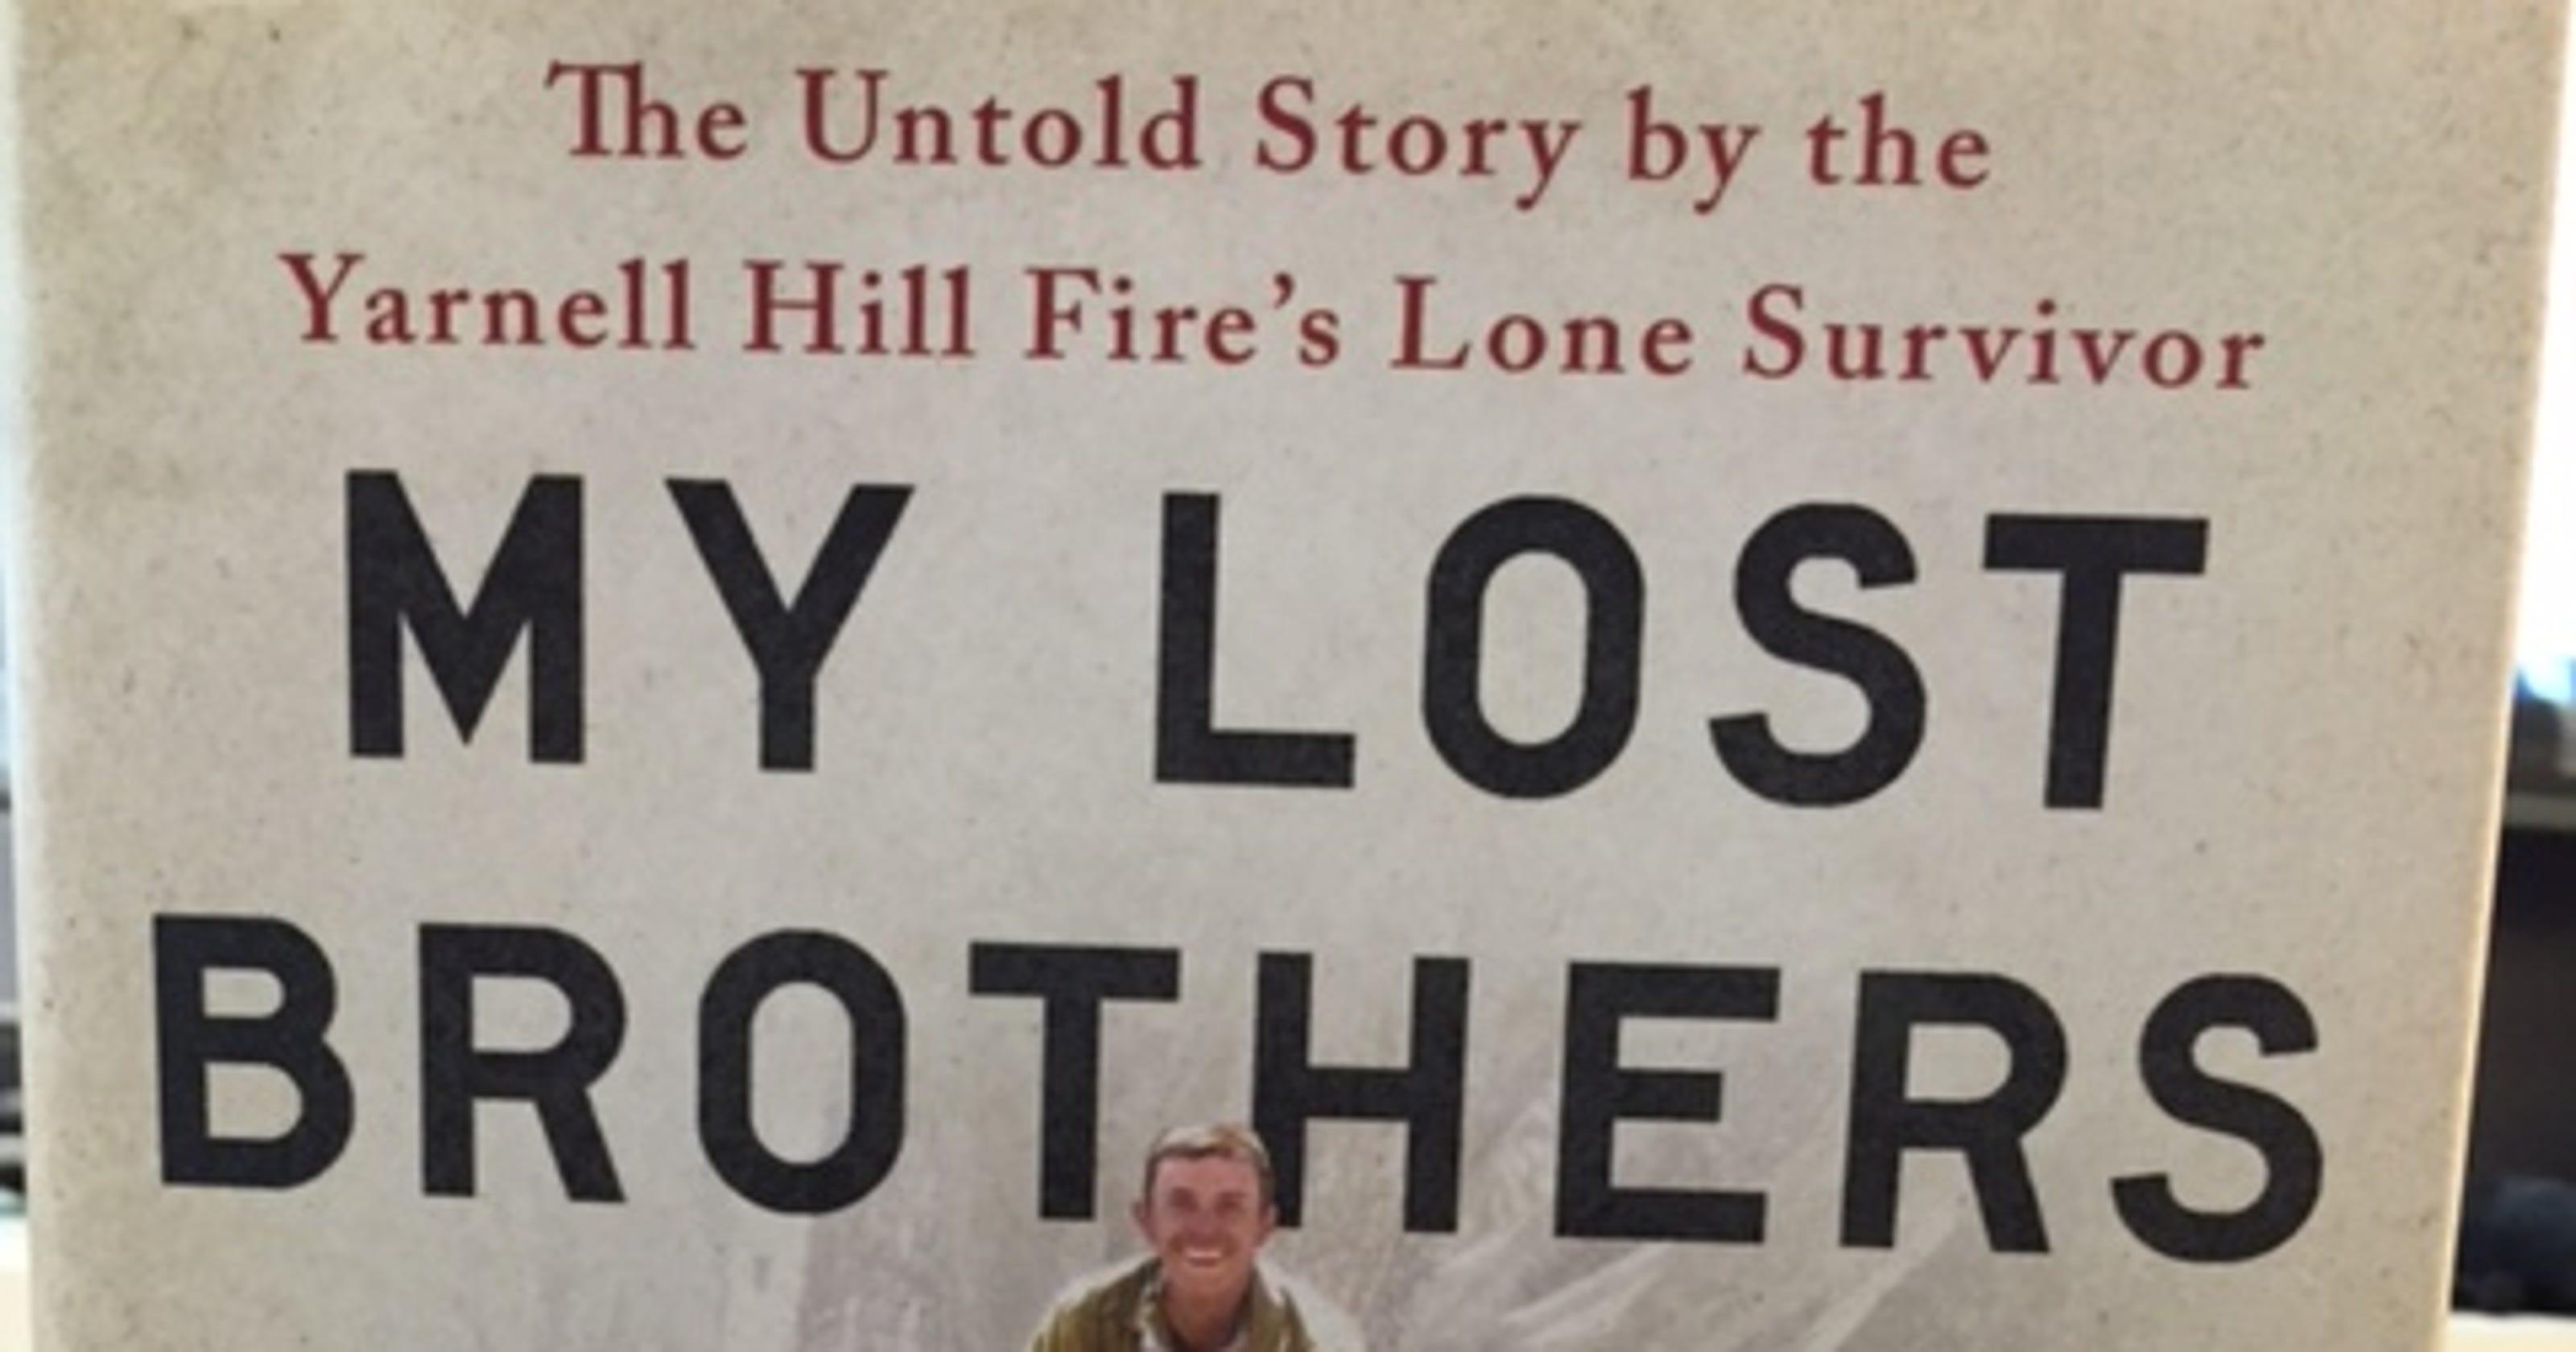 Granite Mountain Hotshots' 'lone survivor': 'The fire was huffing